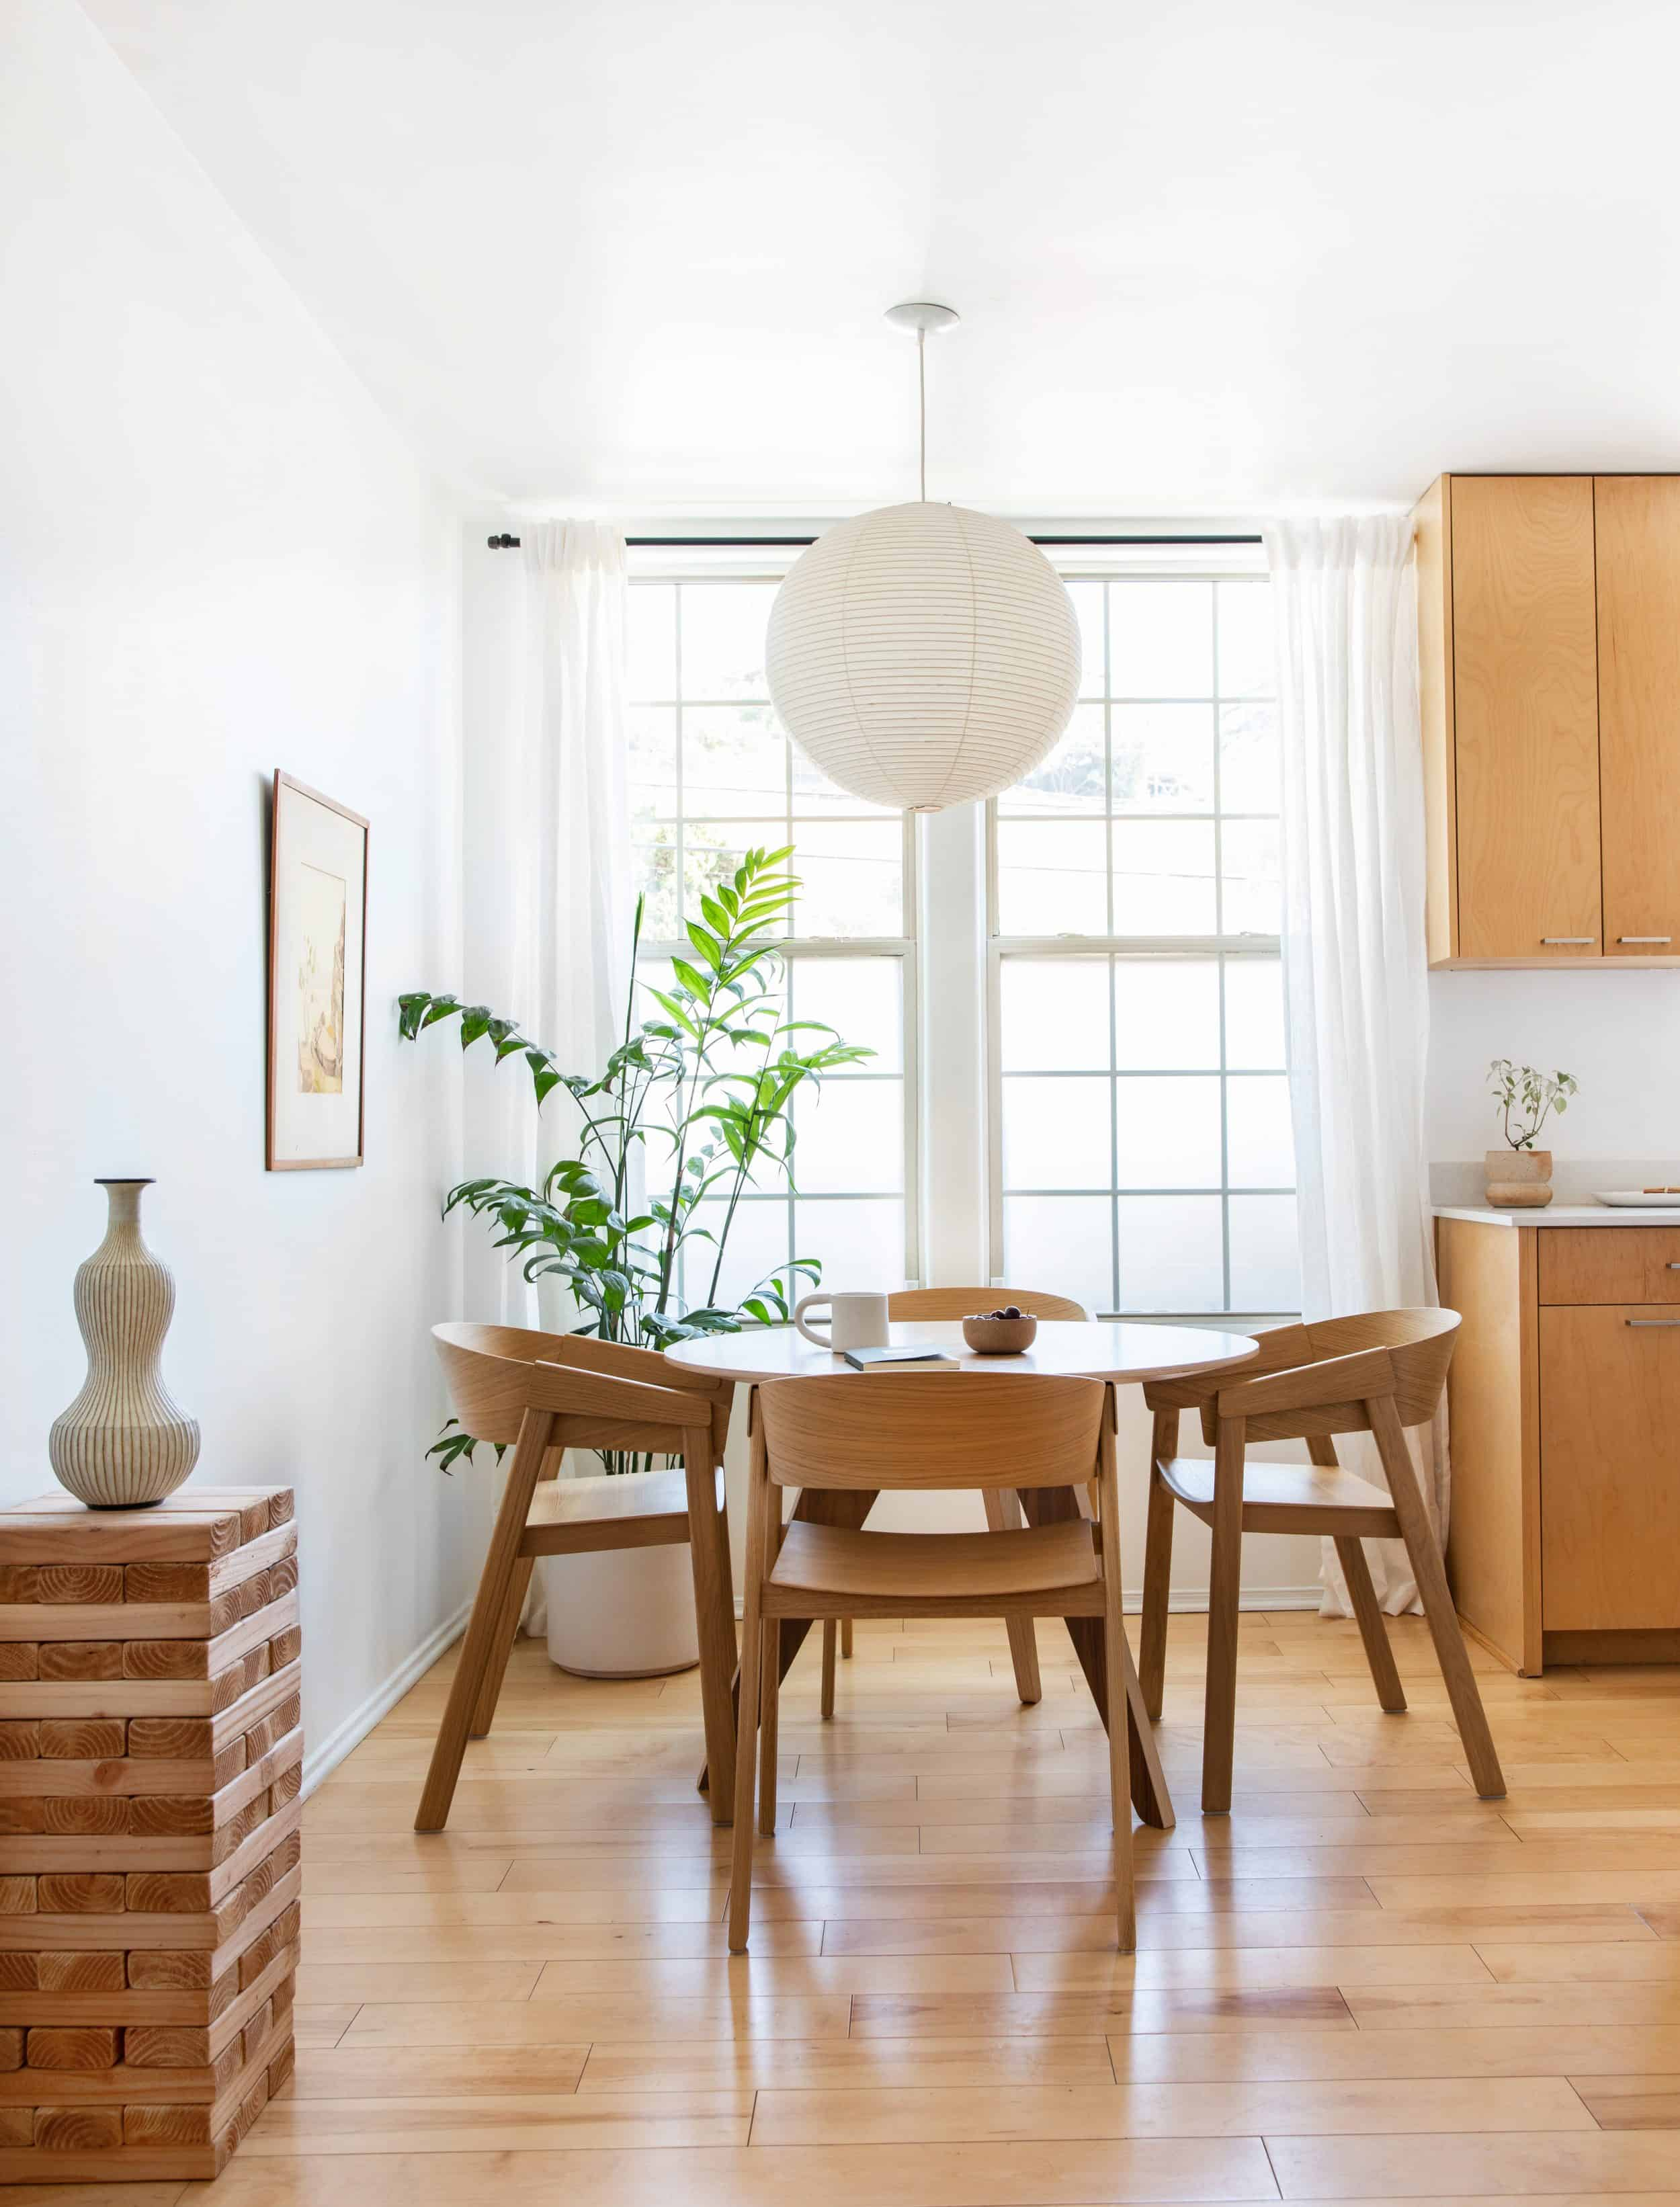 Melanie Burstin Dining Room 1